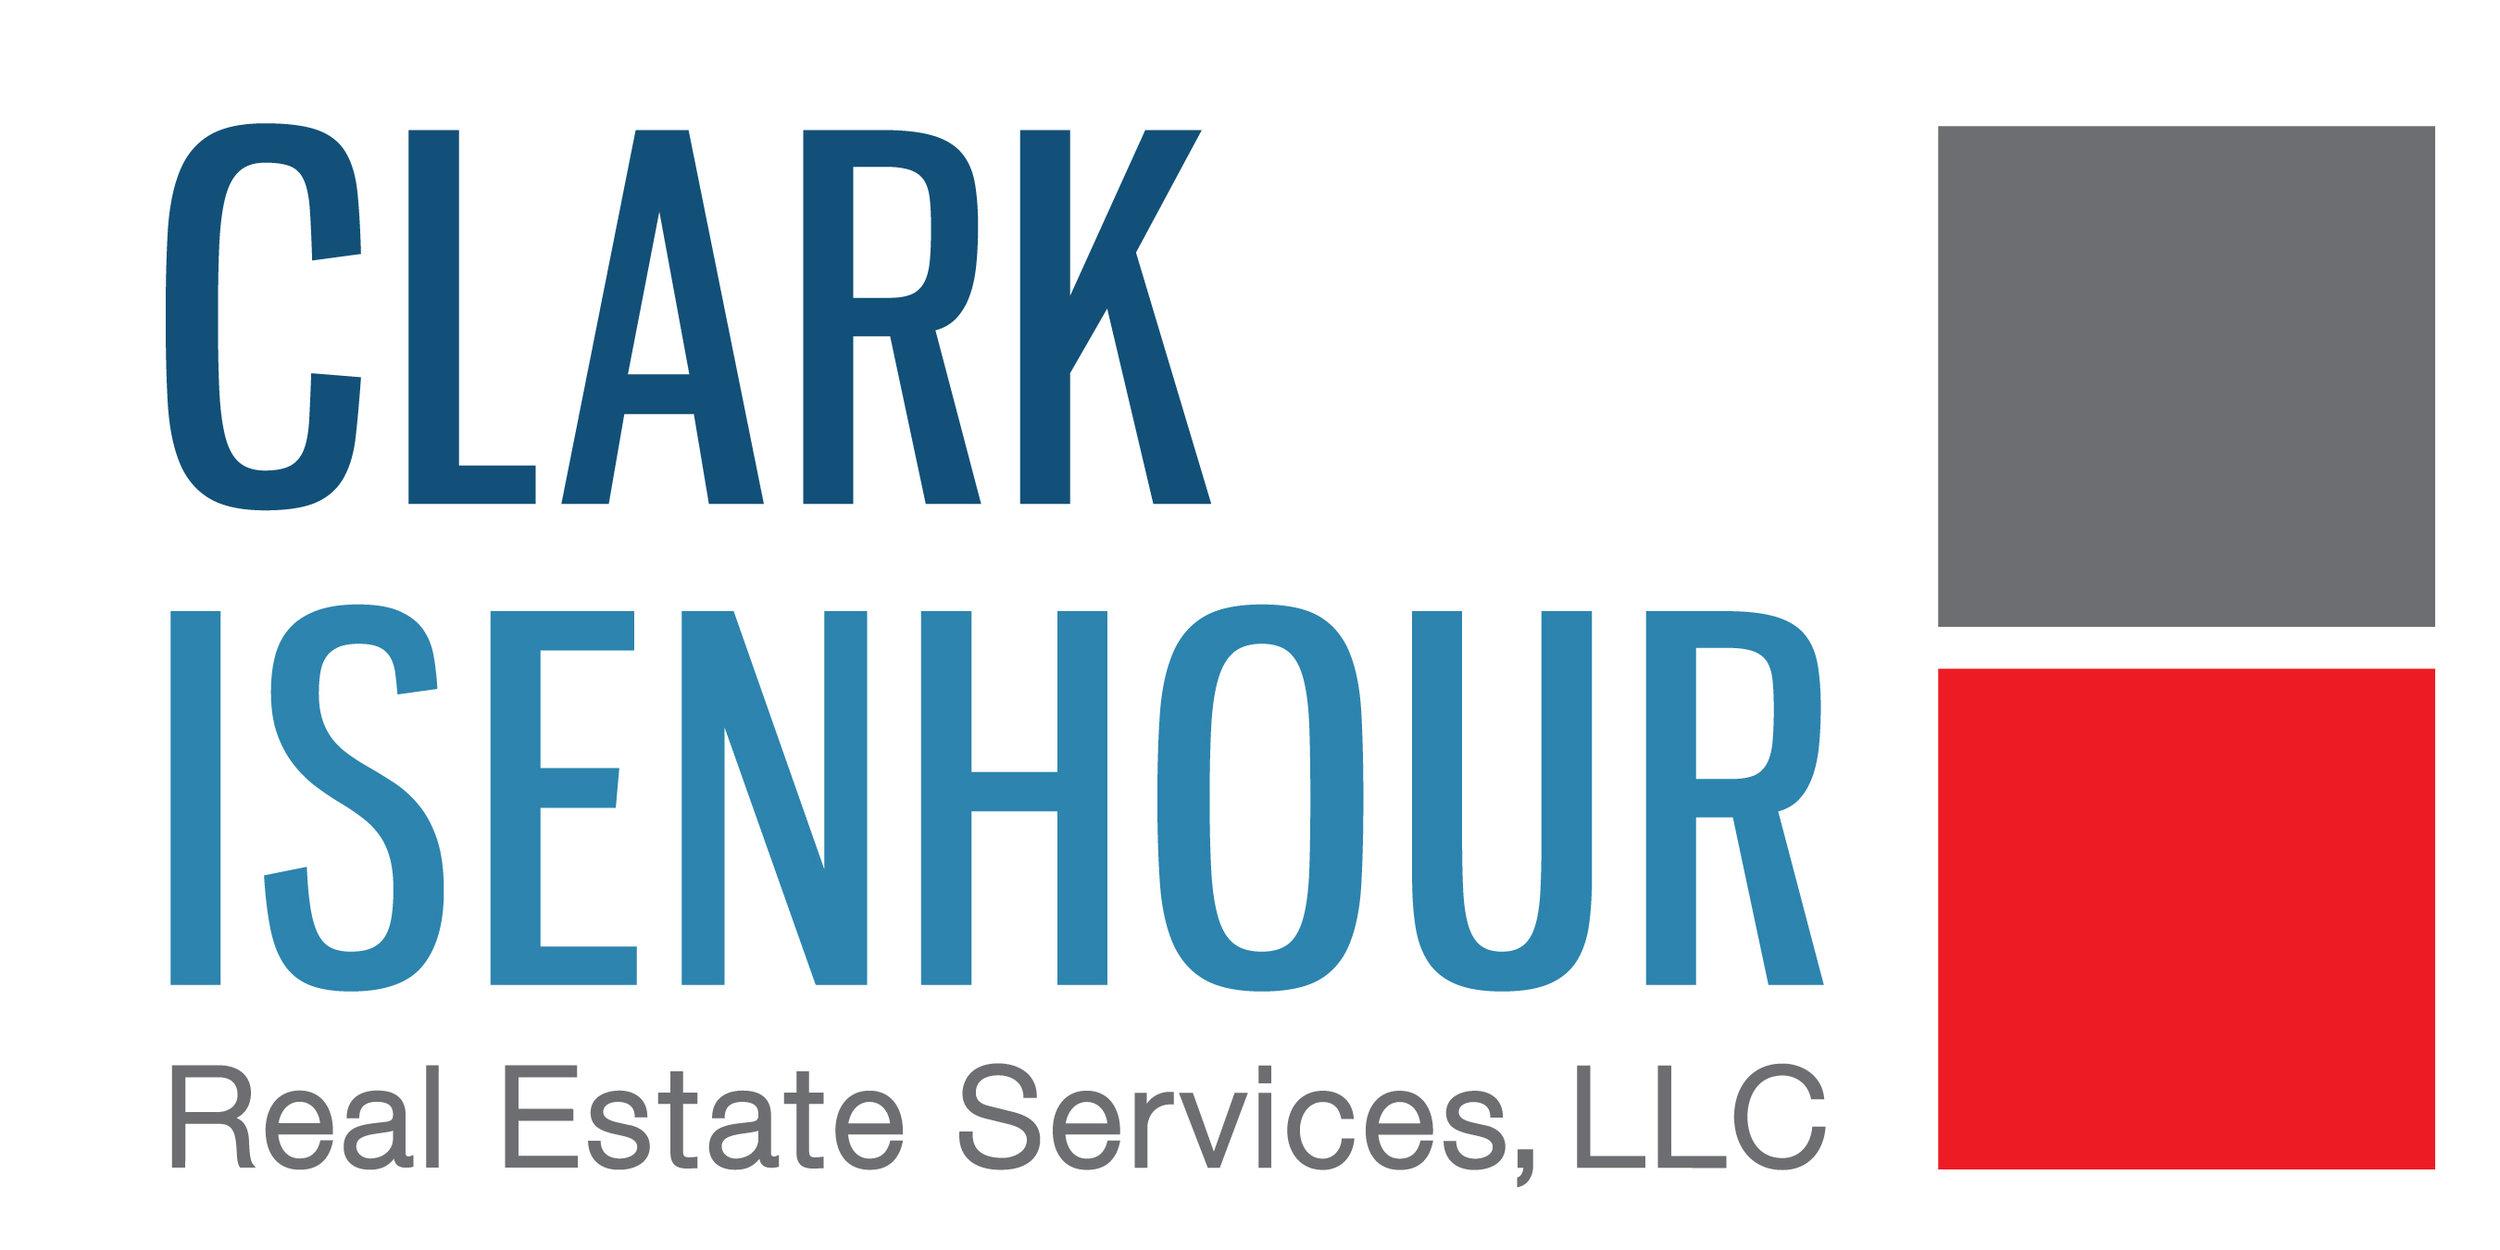 Clark Isenhour Logo(16x9).jpg